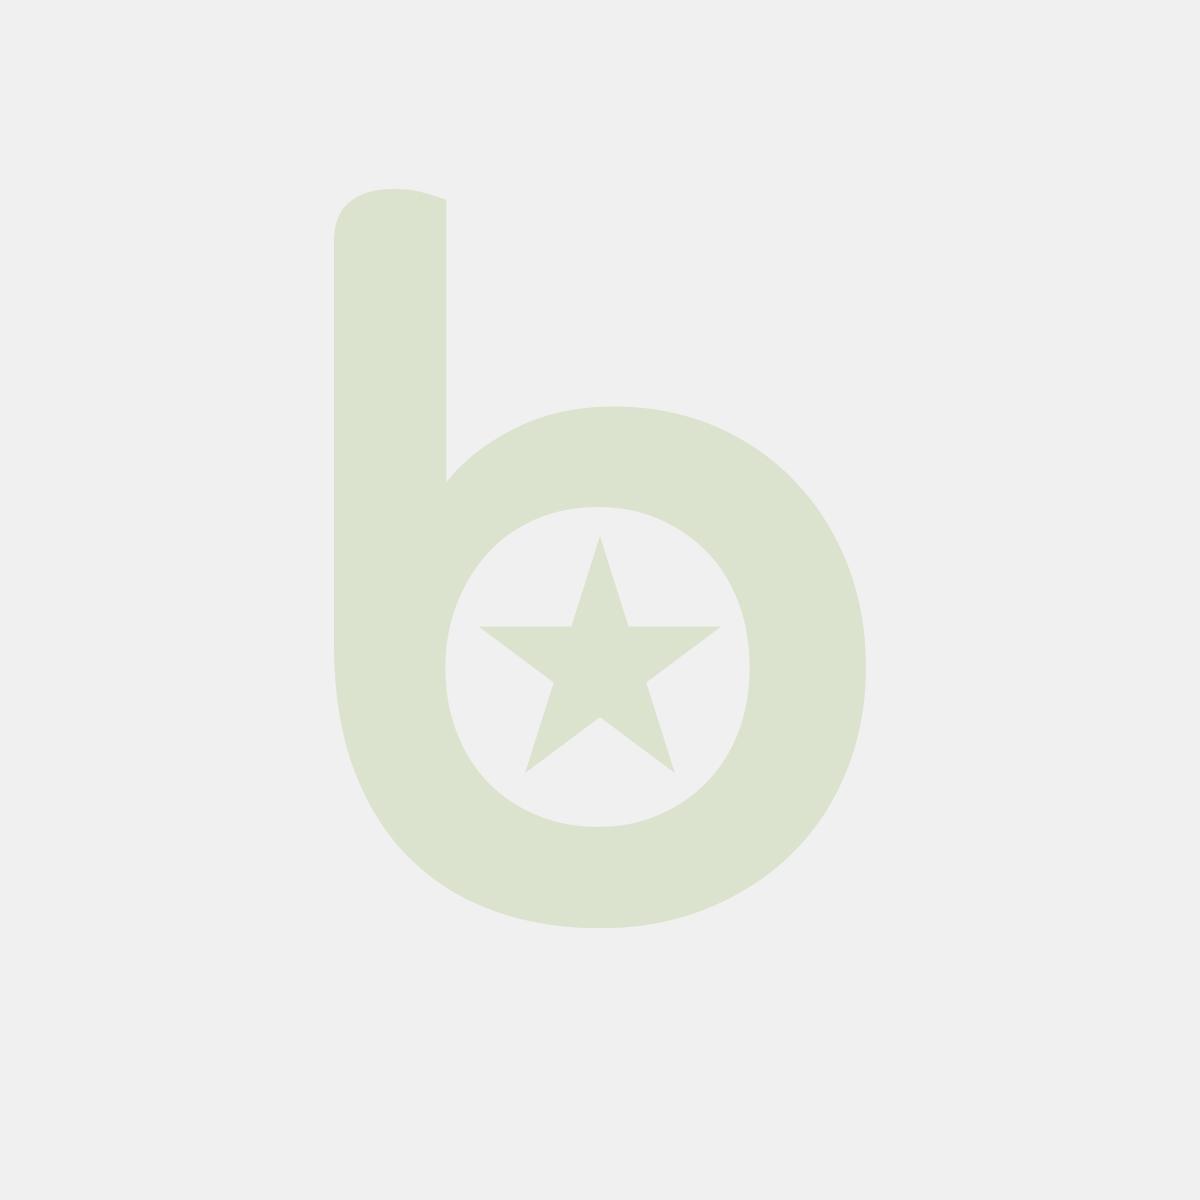 Schładzarka szokowa 5XGN 1/1 - kod 232170